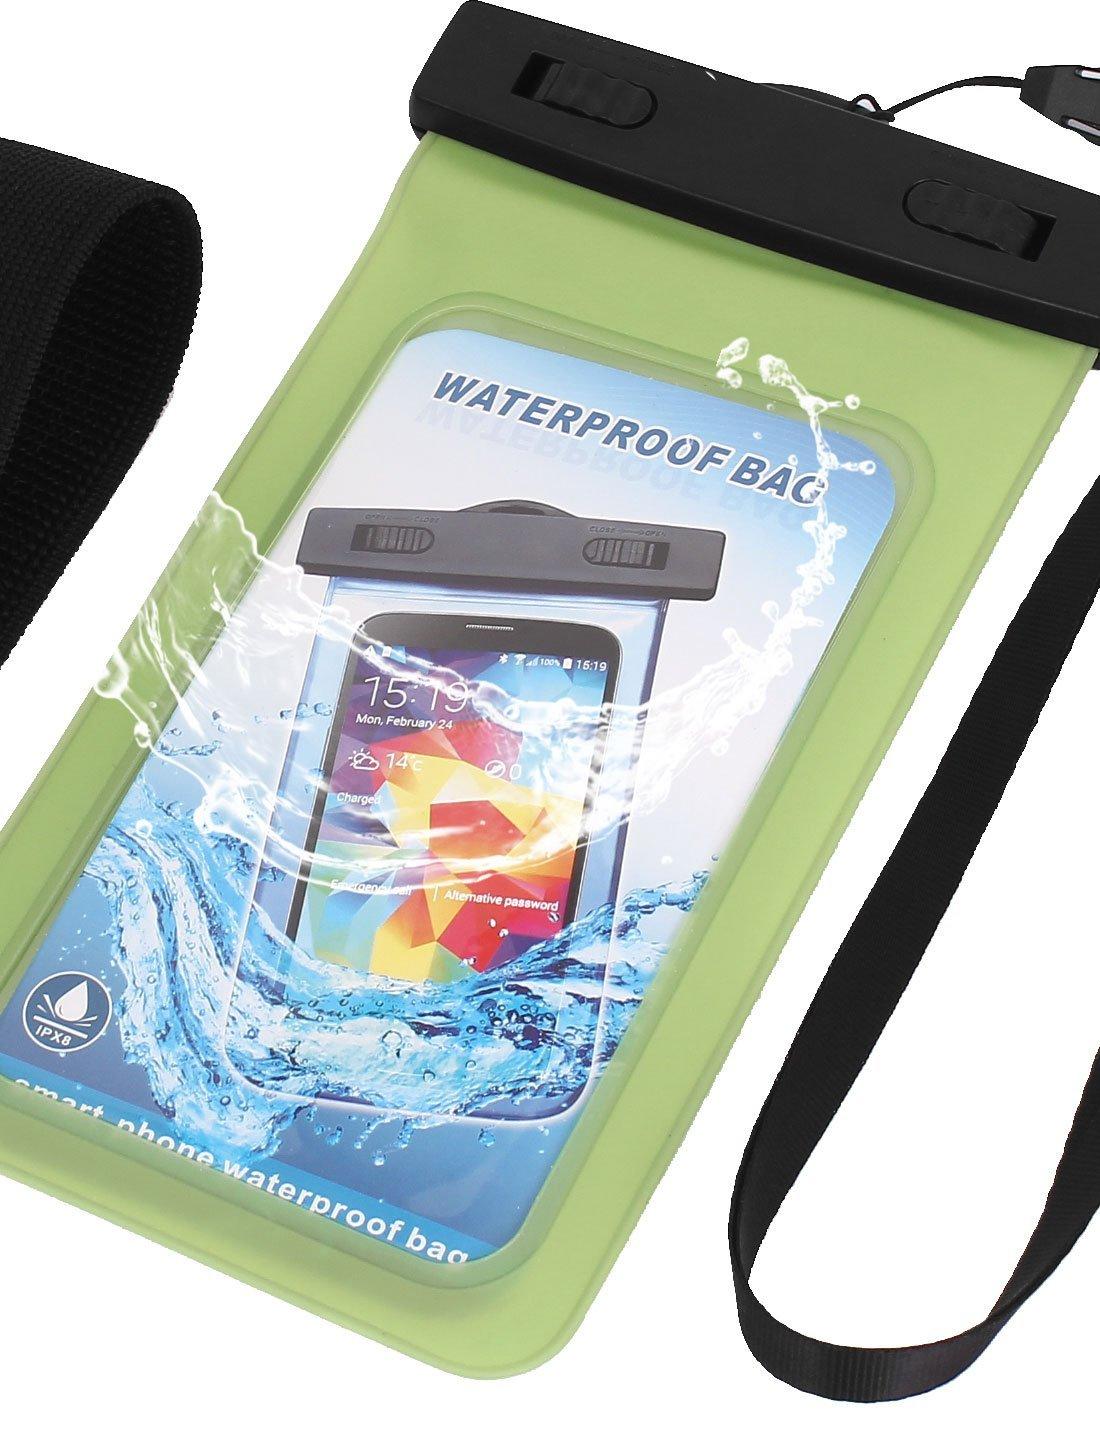 Amazon.com : eDealMax A prueba de agua cubierta de la caja del bolso seco de la Bolsa Verde w brazalete Para el teléfono celular : Sports & Outdoors